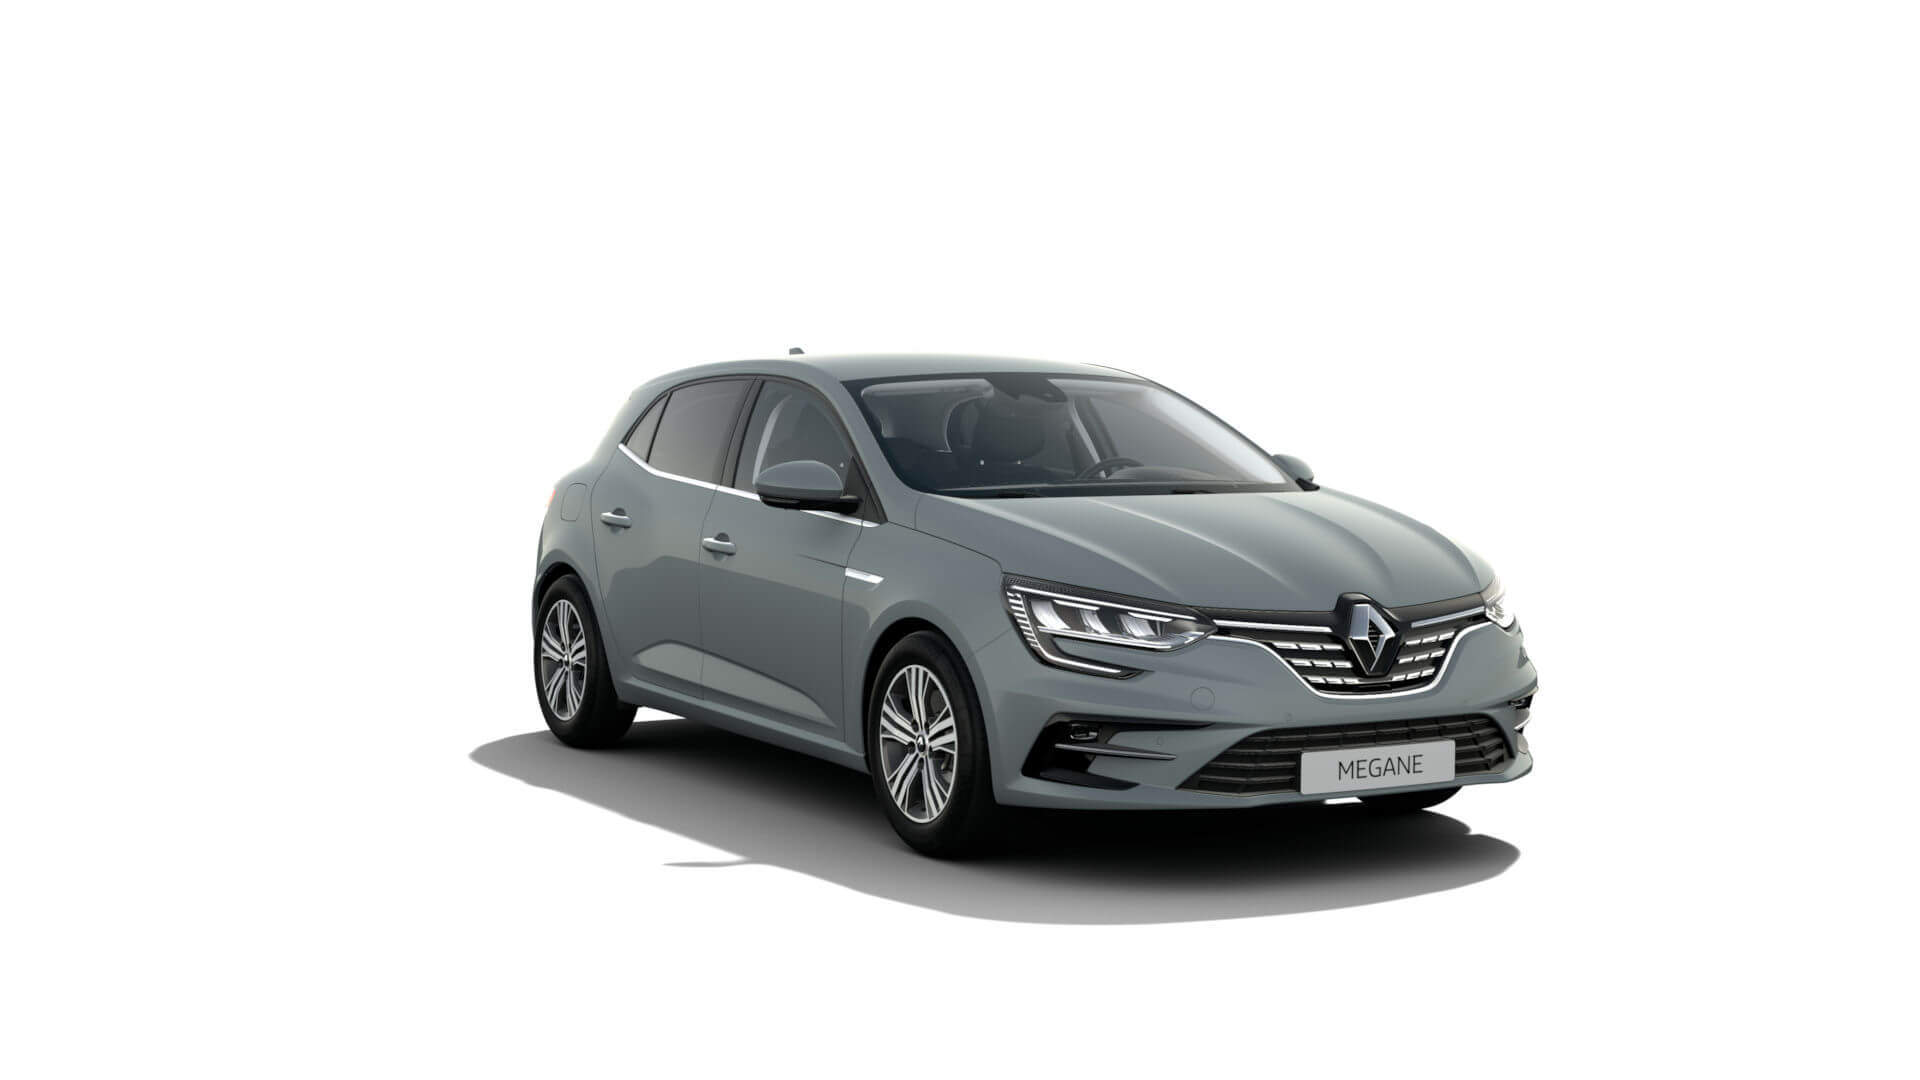 Automodell graugrün - Renault Megane - Renault Ahrens Hannover